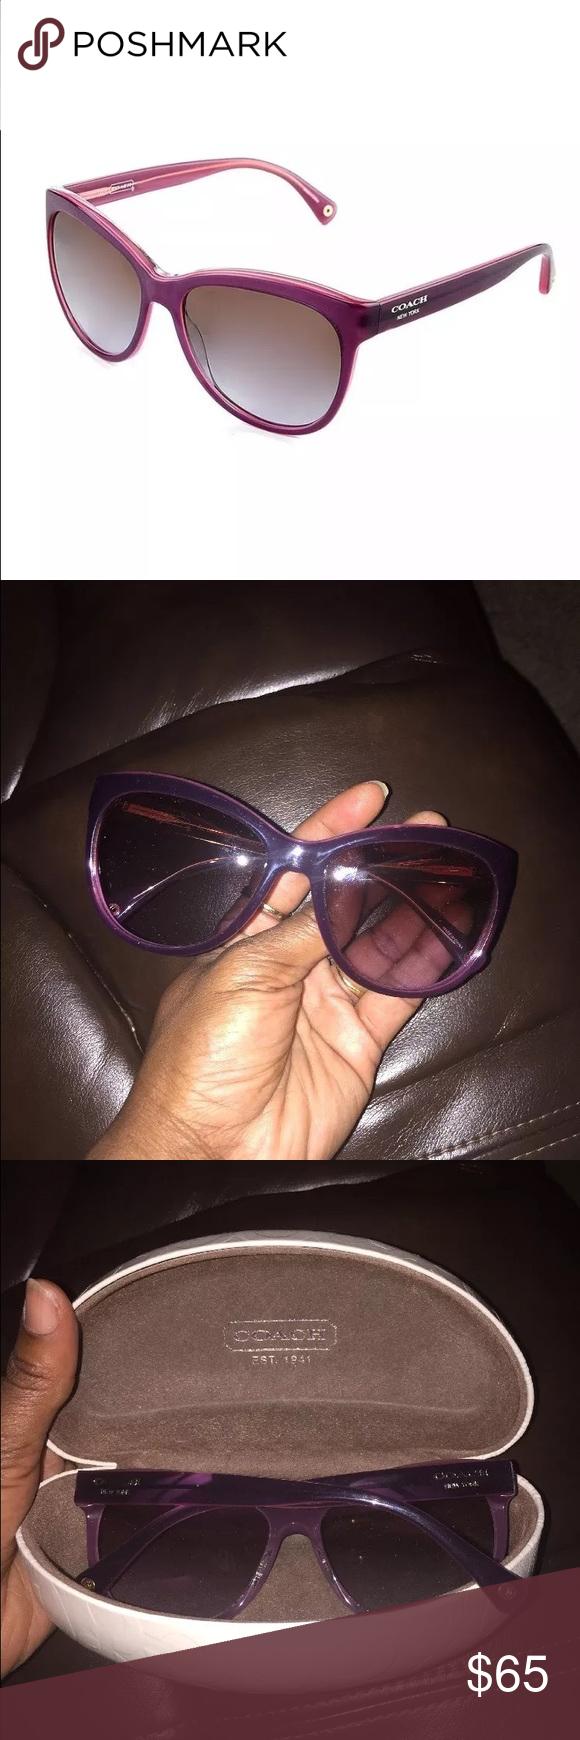 Coach purple shades Coach purple shades Coach Accessories Sunglasses